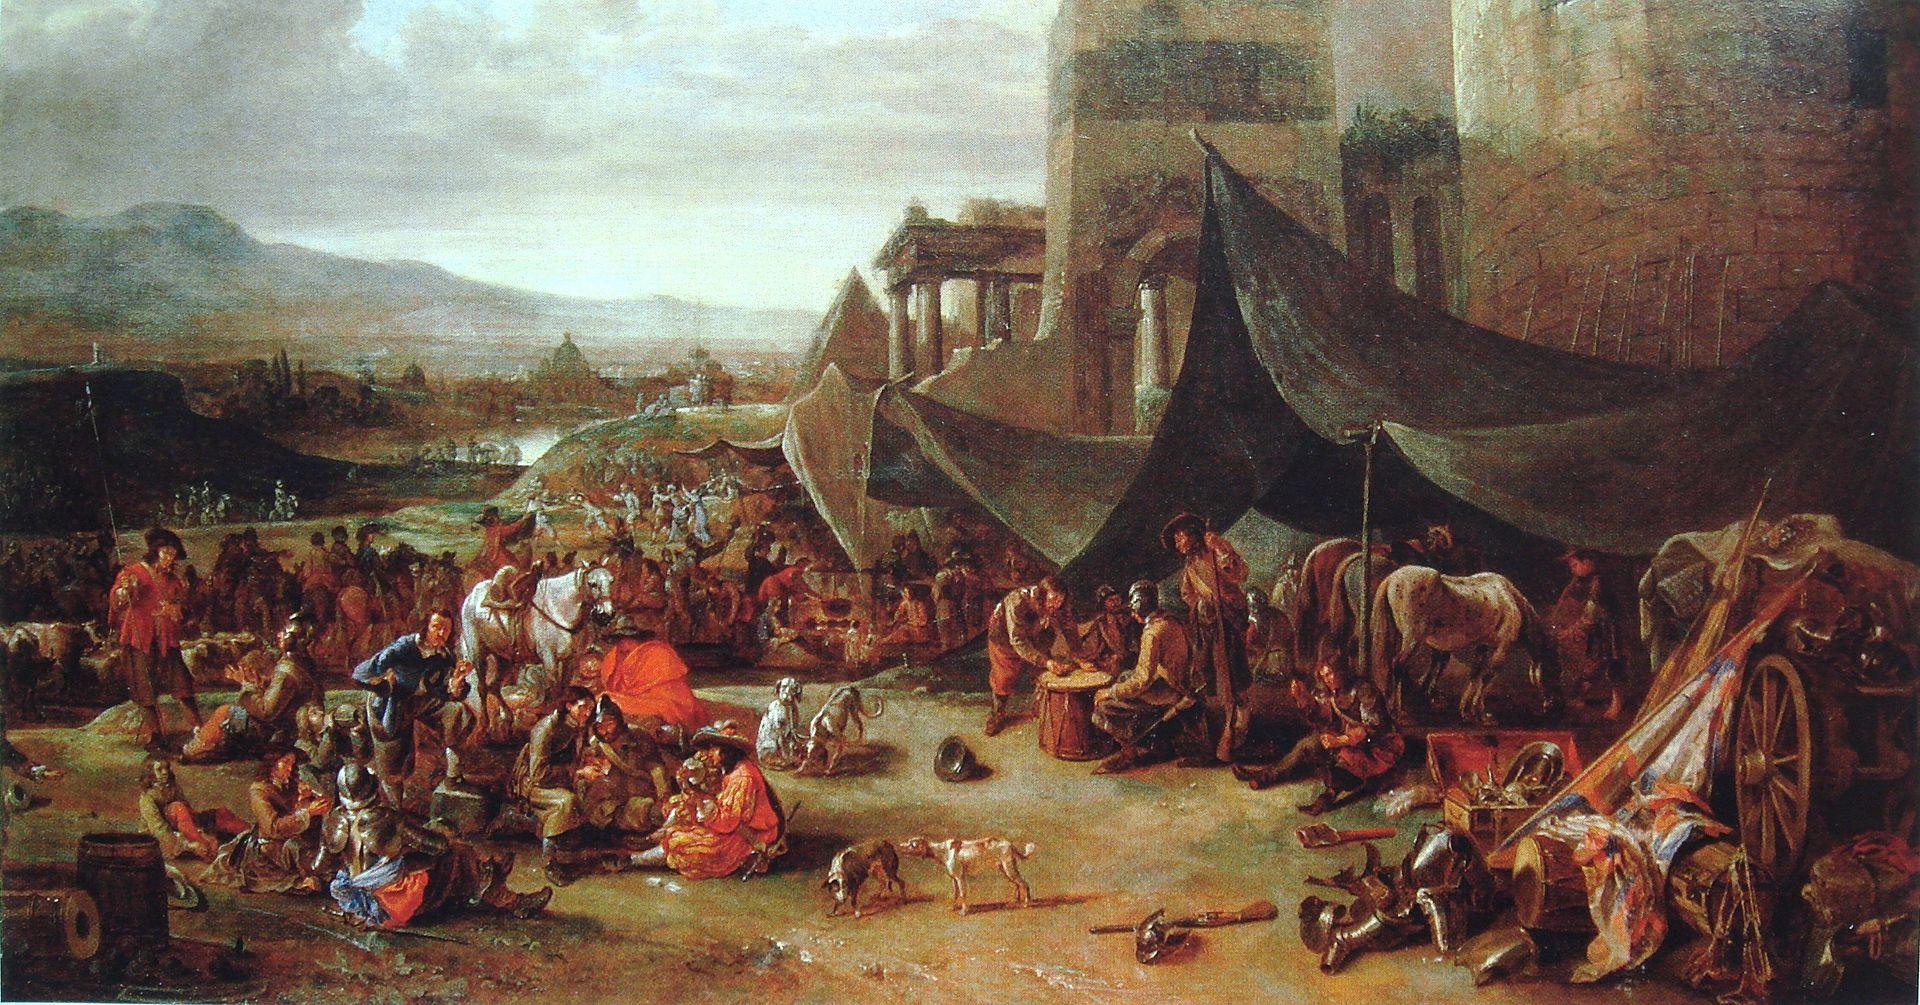 sack_of_rome_of_1527_by_johannes_lingelbach_17th_century.jpg